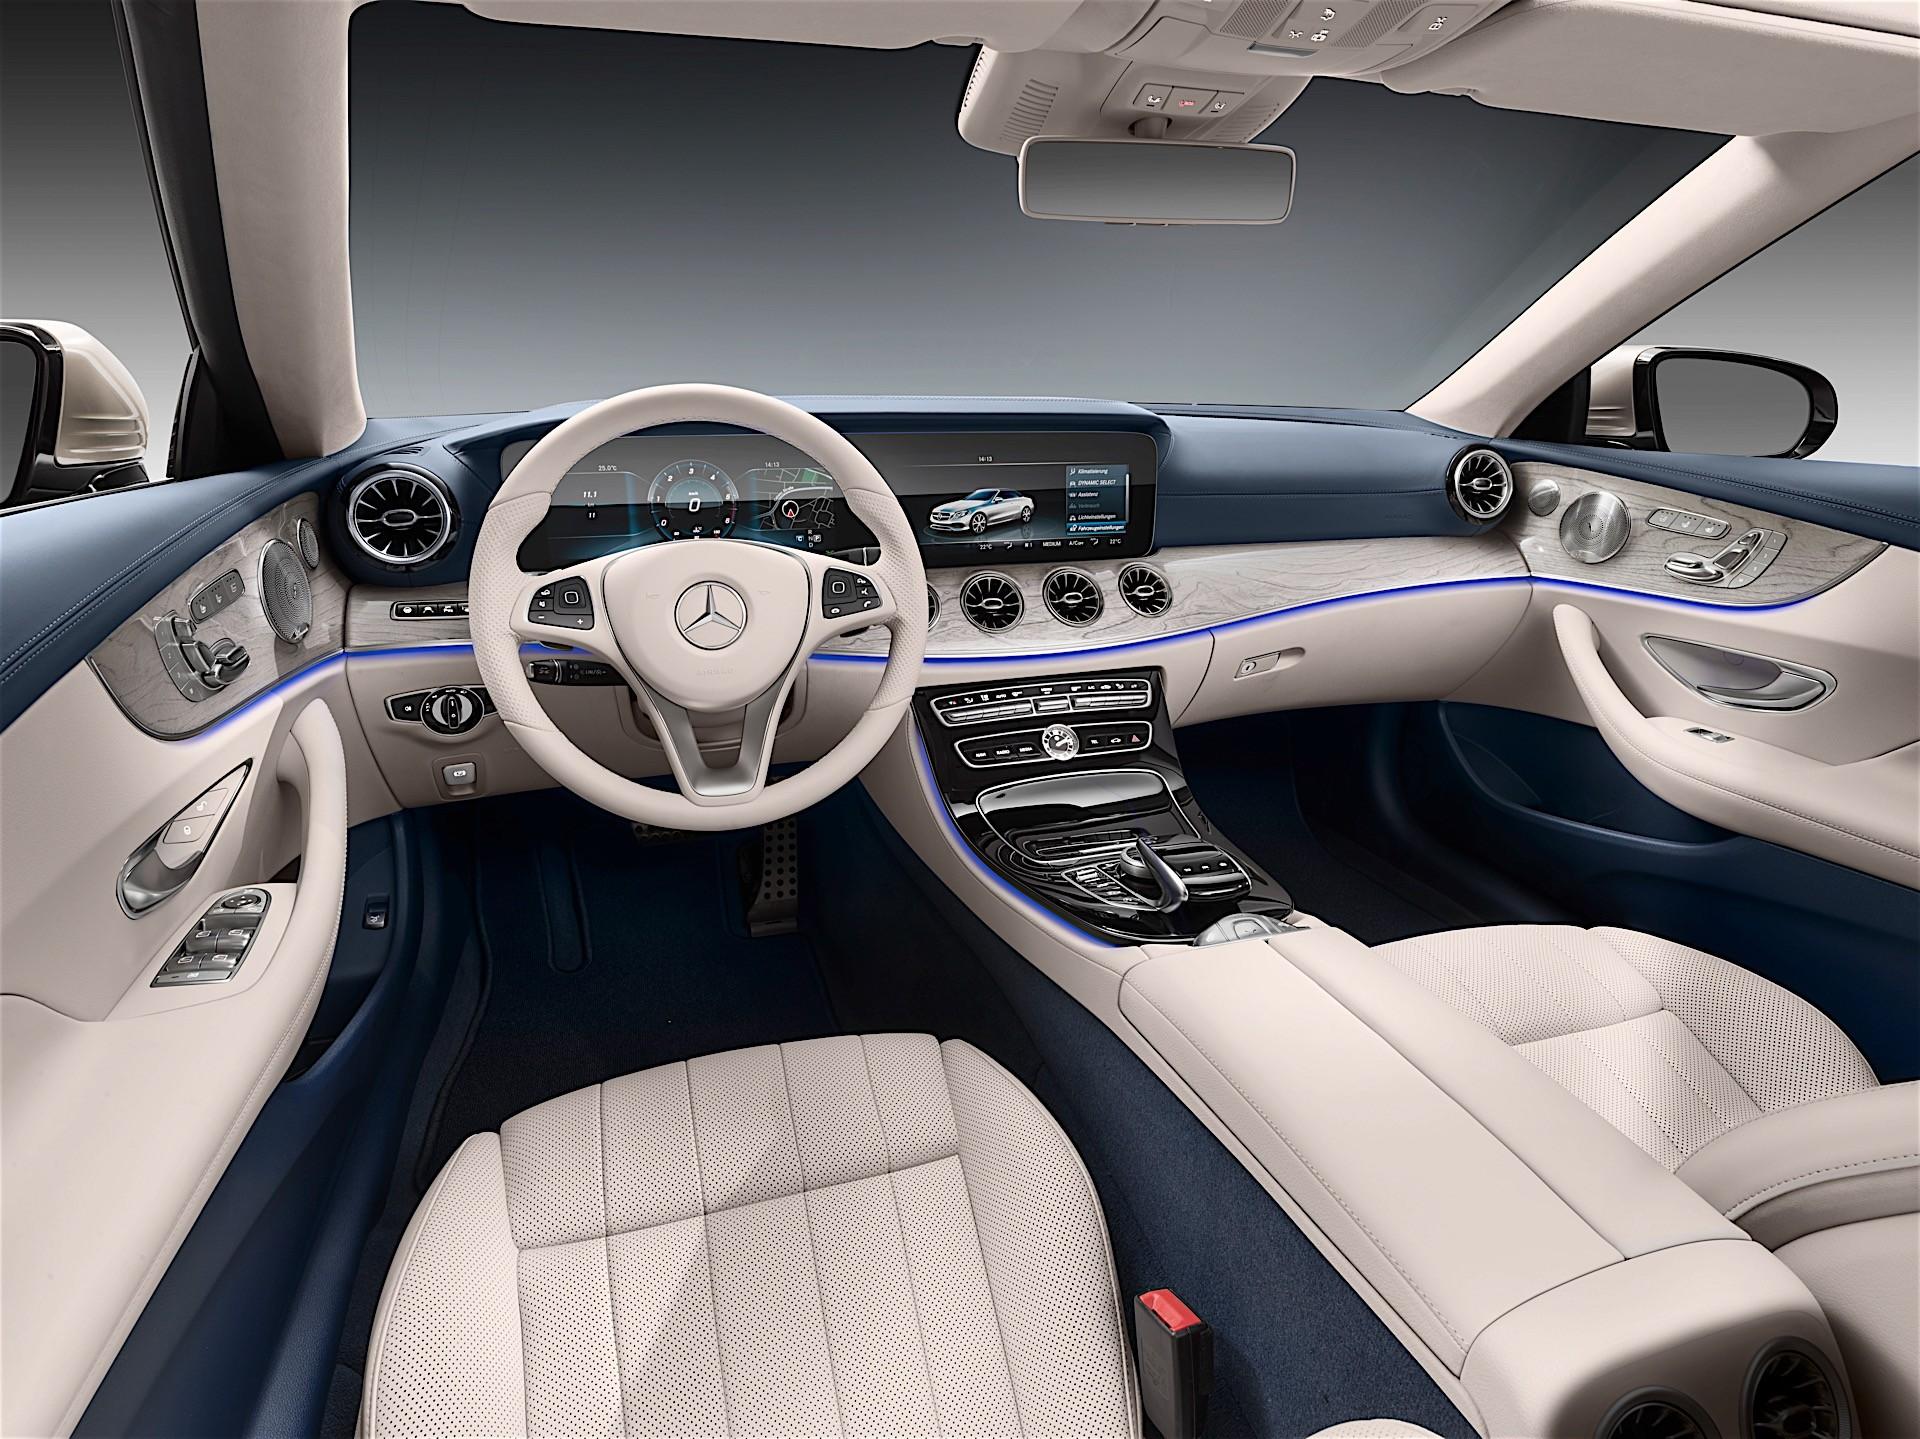 2018 mercedes benz e350 coupe and cabrio introduce mild hybrid m 264 engine autoevolution. Black Bedroom Furniture Sets. Home Design Ideas